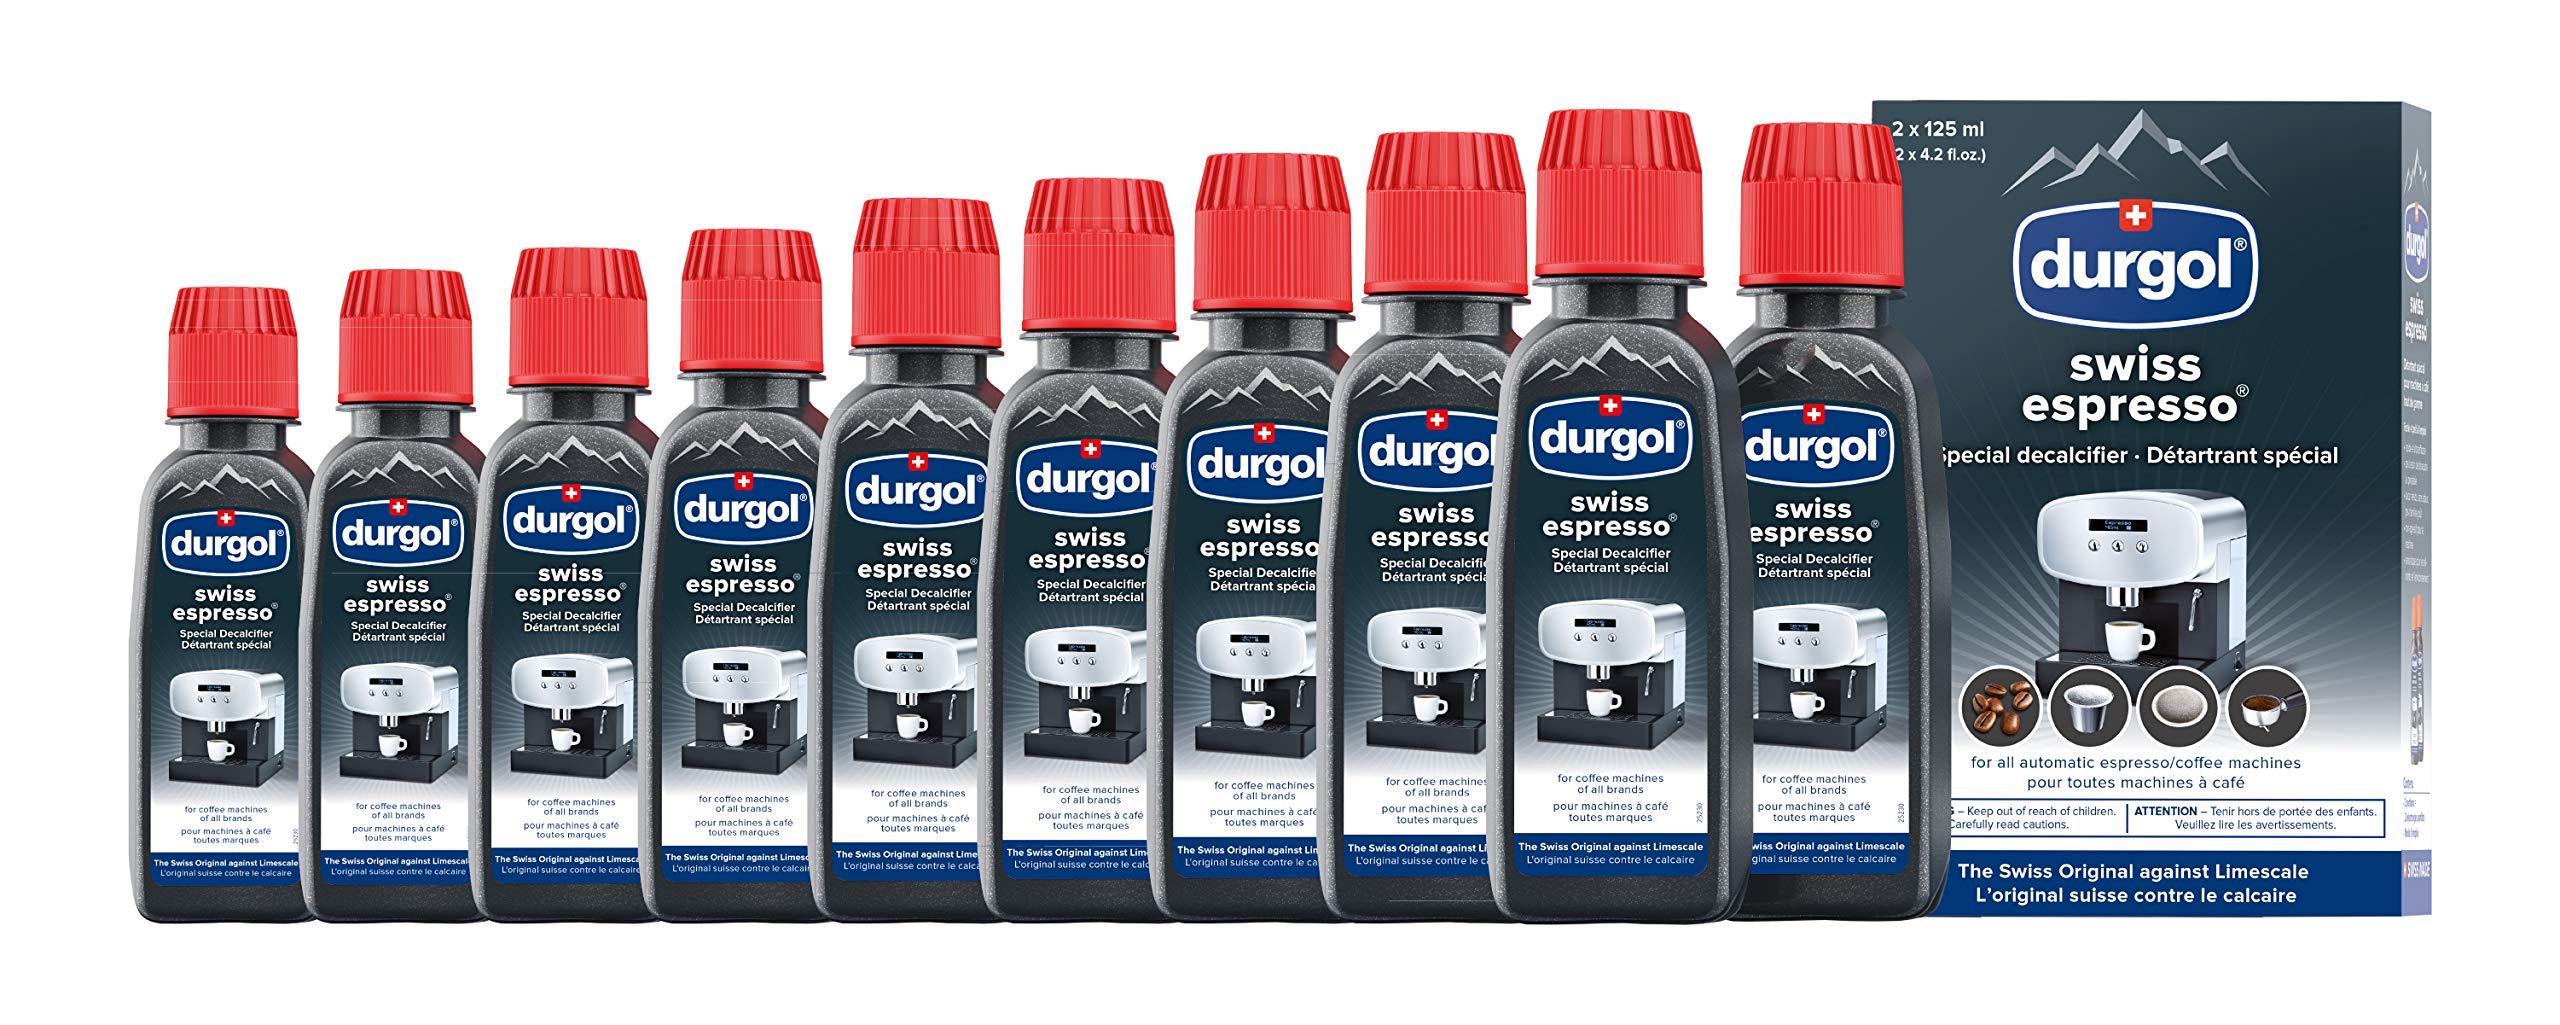 Durgol Swiss Espresso Decalcifier for All Brands High-End Espresso Machines, 4.2 Fluid Ounce Bottle, 5-Pack